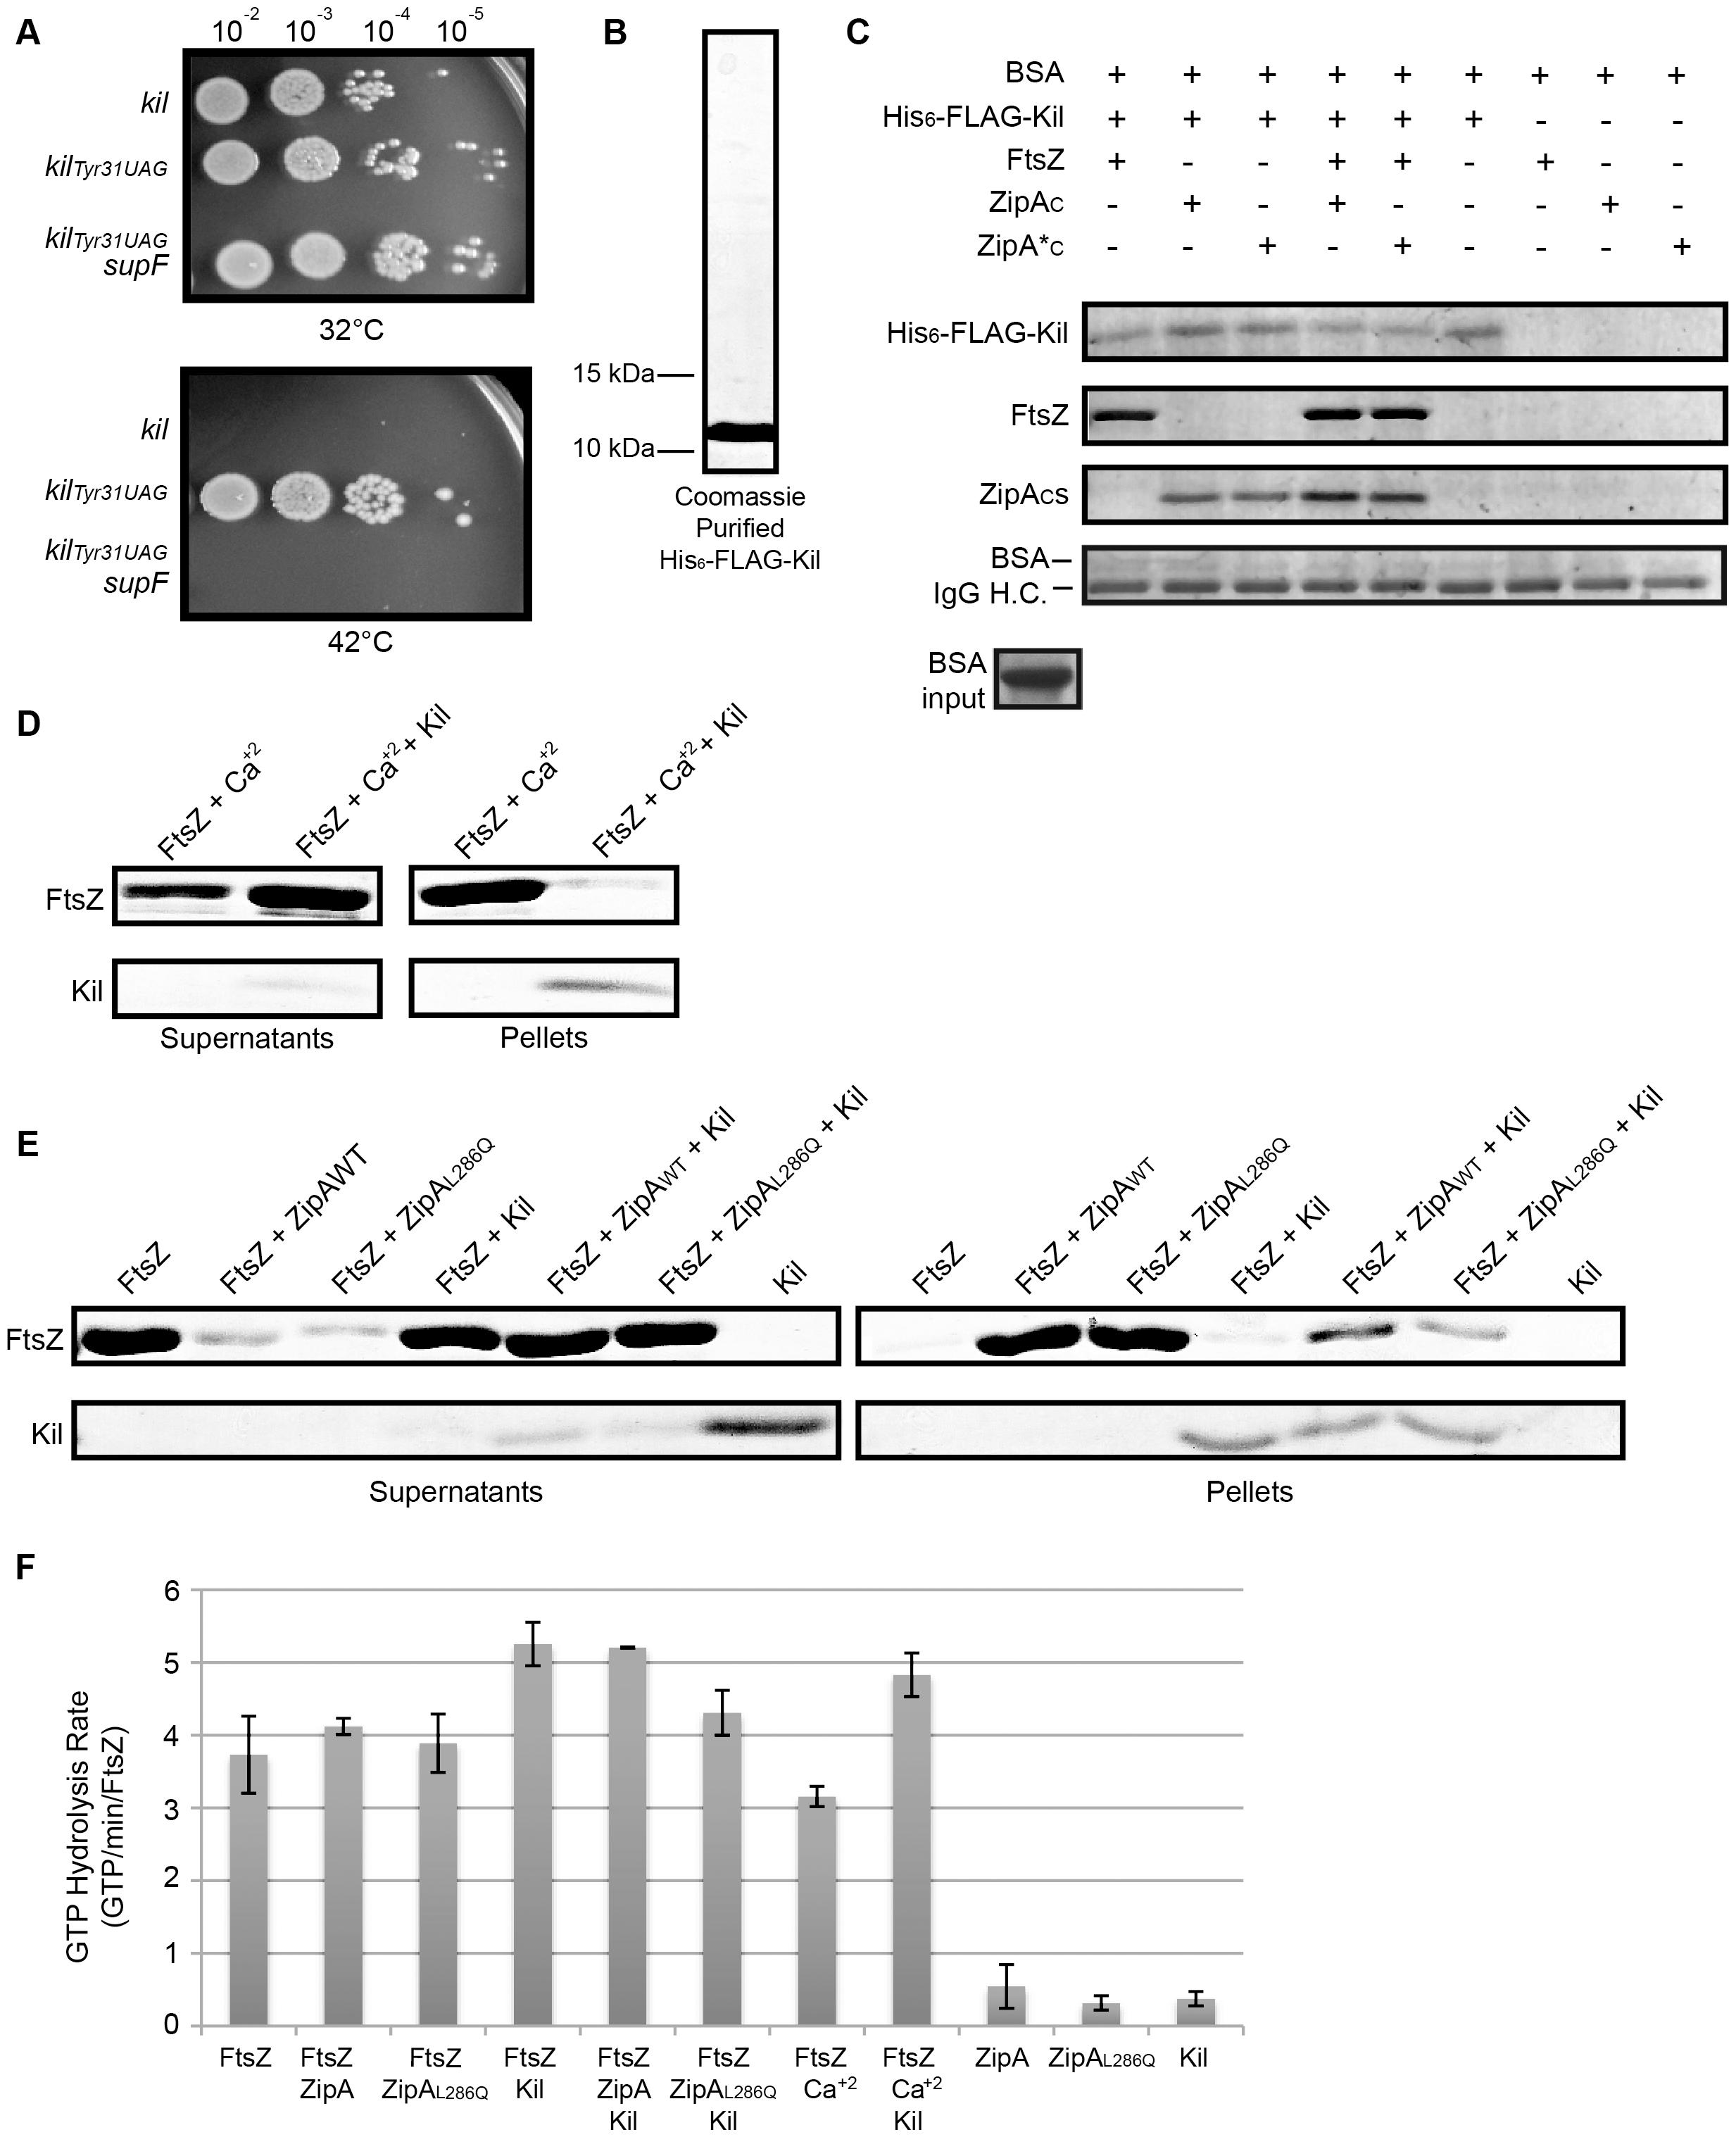 Kil protein copurifies with FtsZ and ZipA and inhibits FtsZ bundling <i>in vitro</i>.